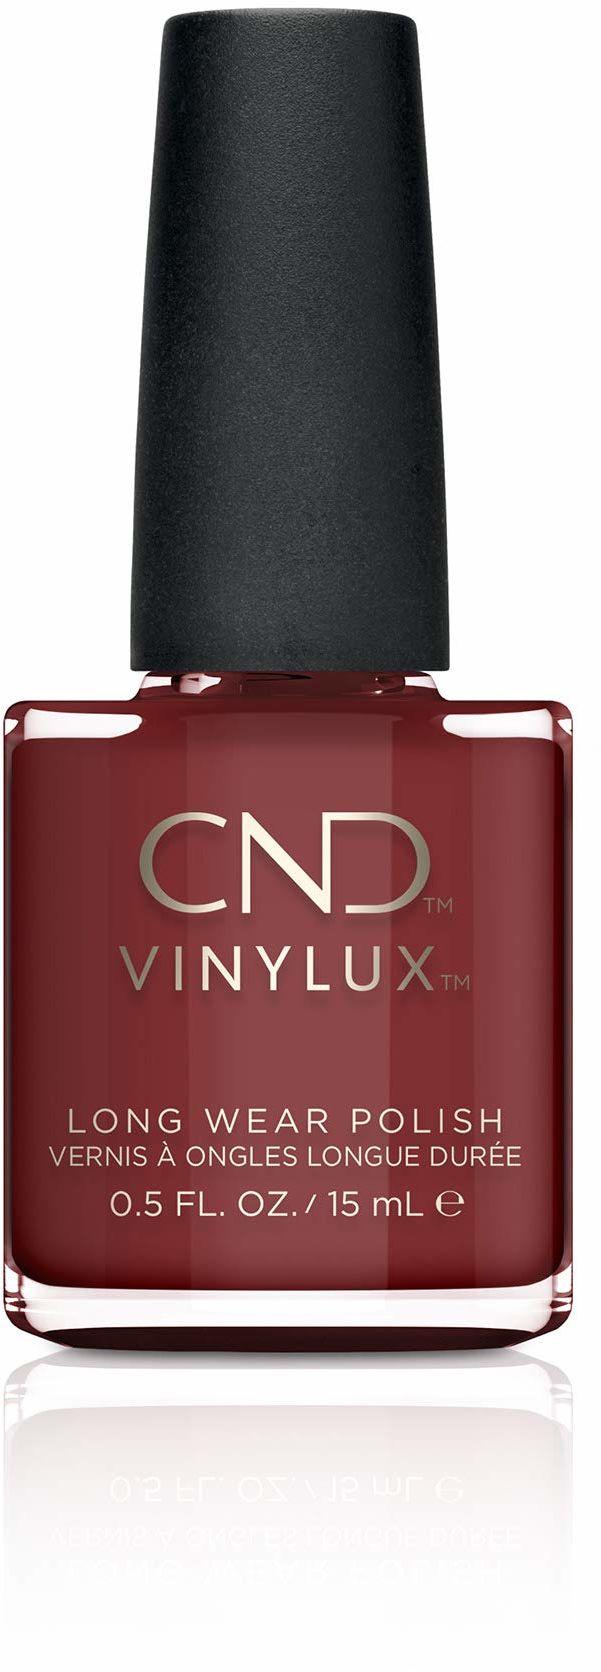 CND Vinylux nr 222, 1 opakowanie (1 x 15 ml)